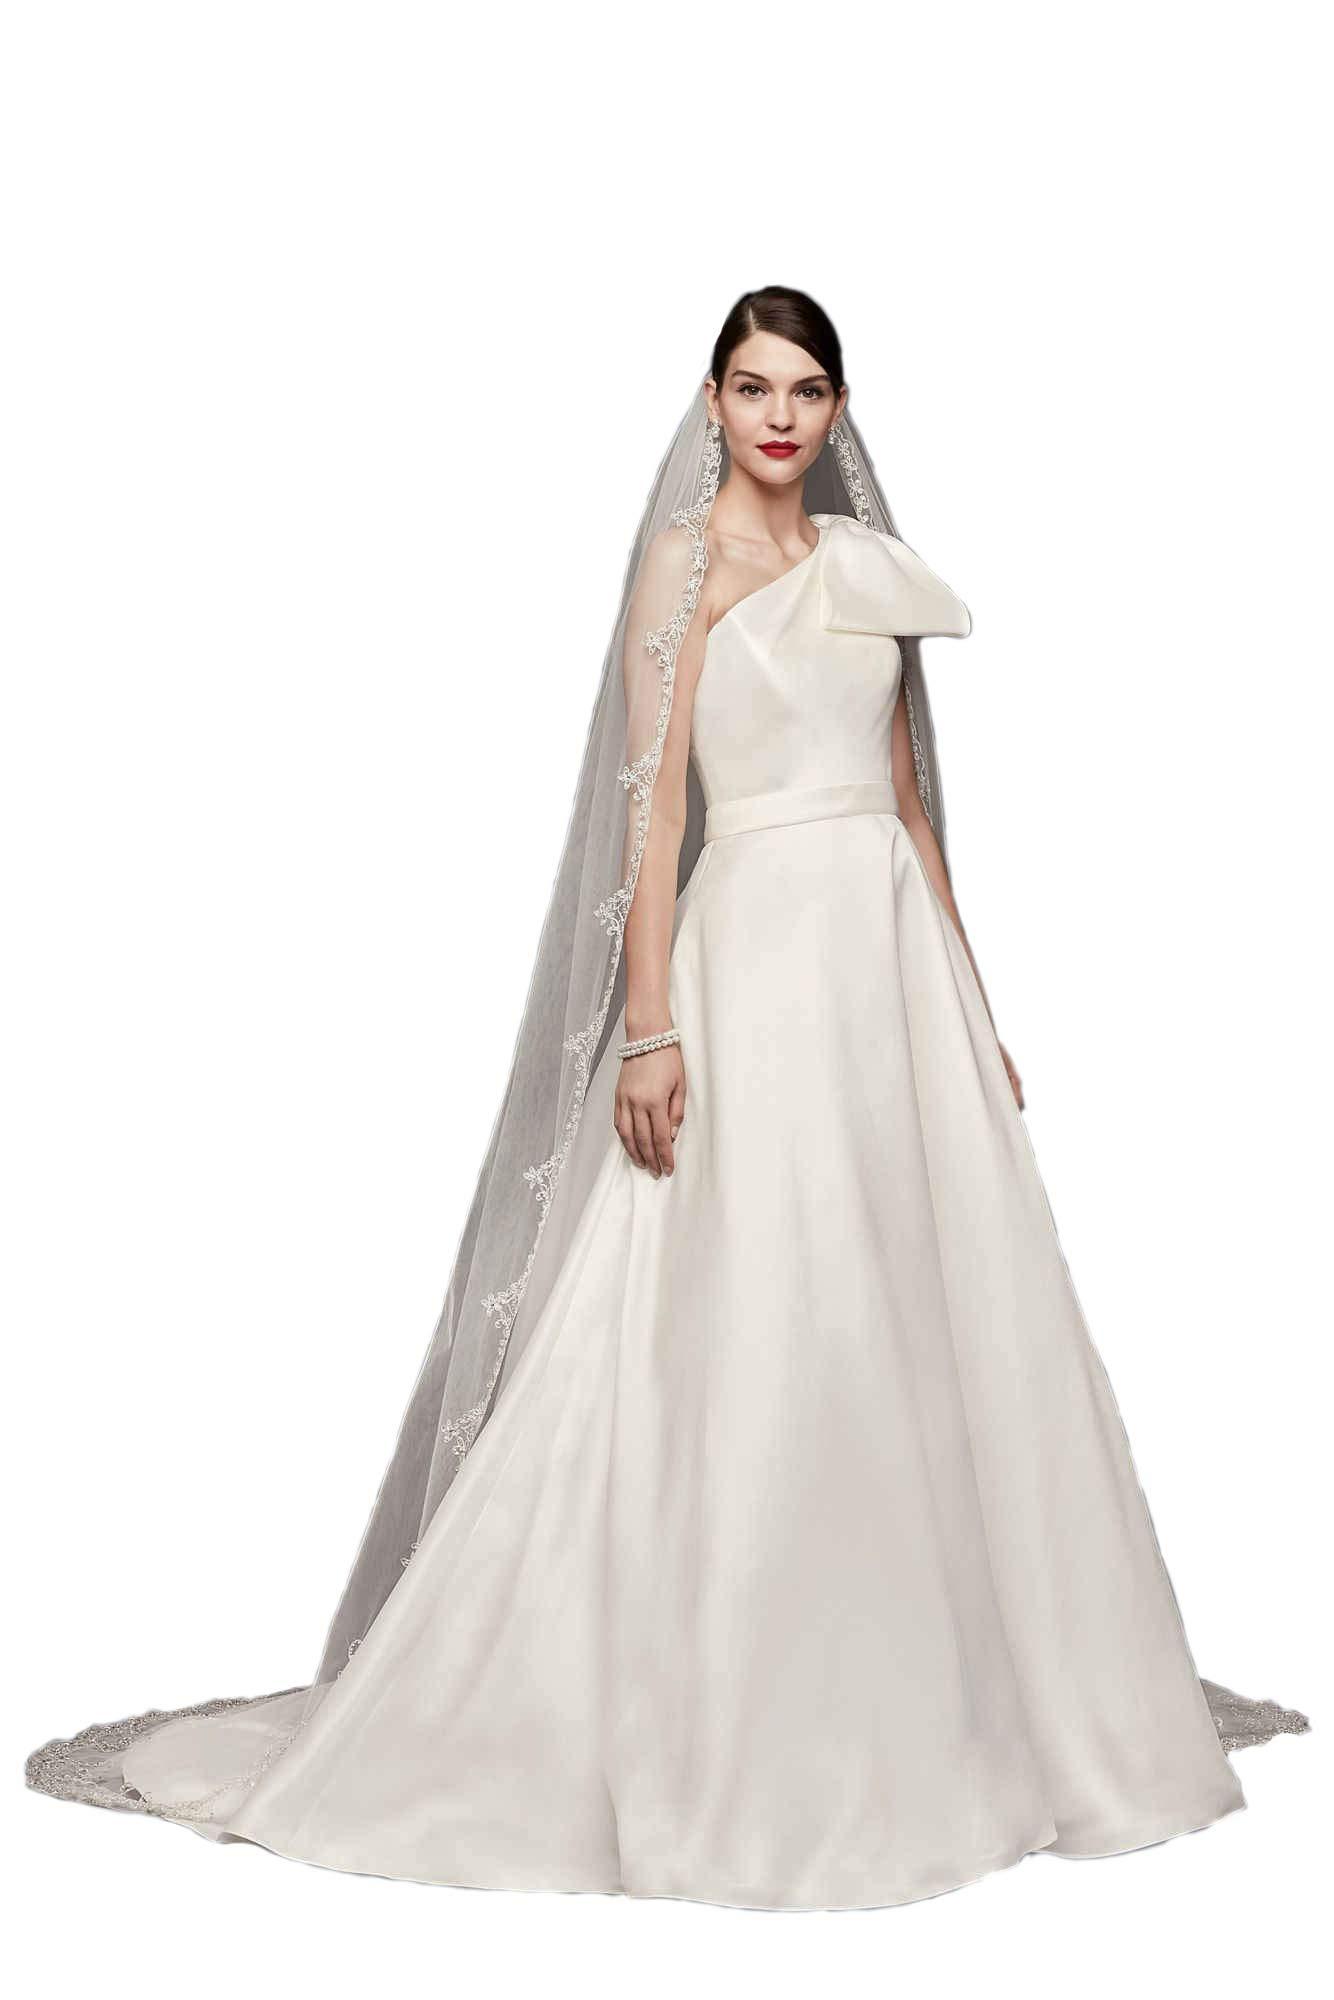 Passat Pale Ivory Single-Tier 3M Cathedral Filigree Metallic Embroider ybeaded edge wedding veil DB65